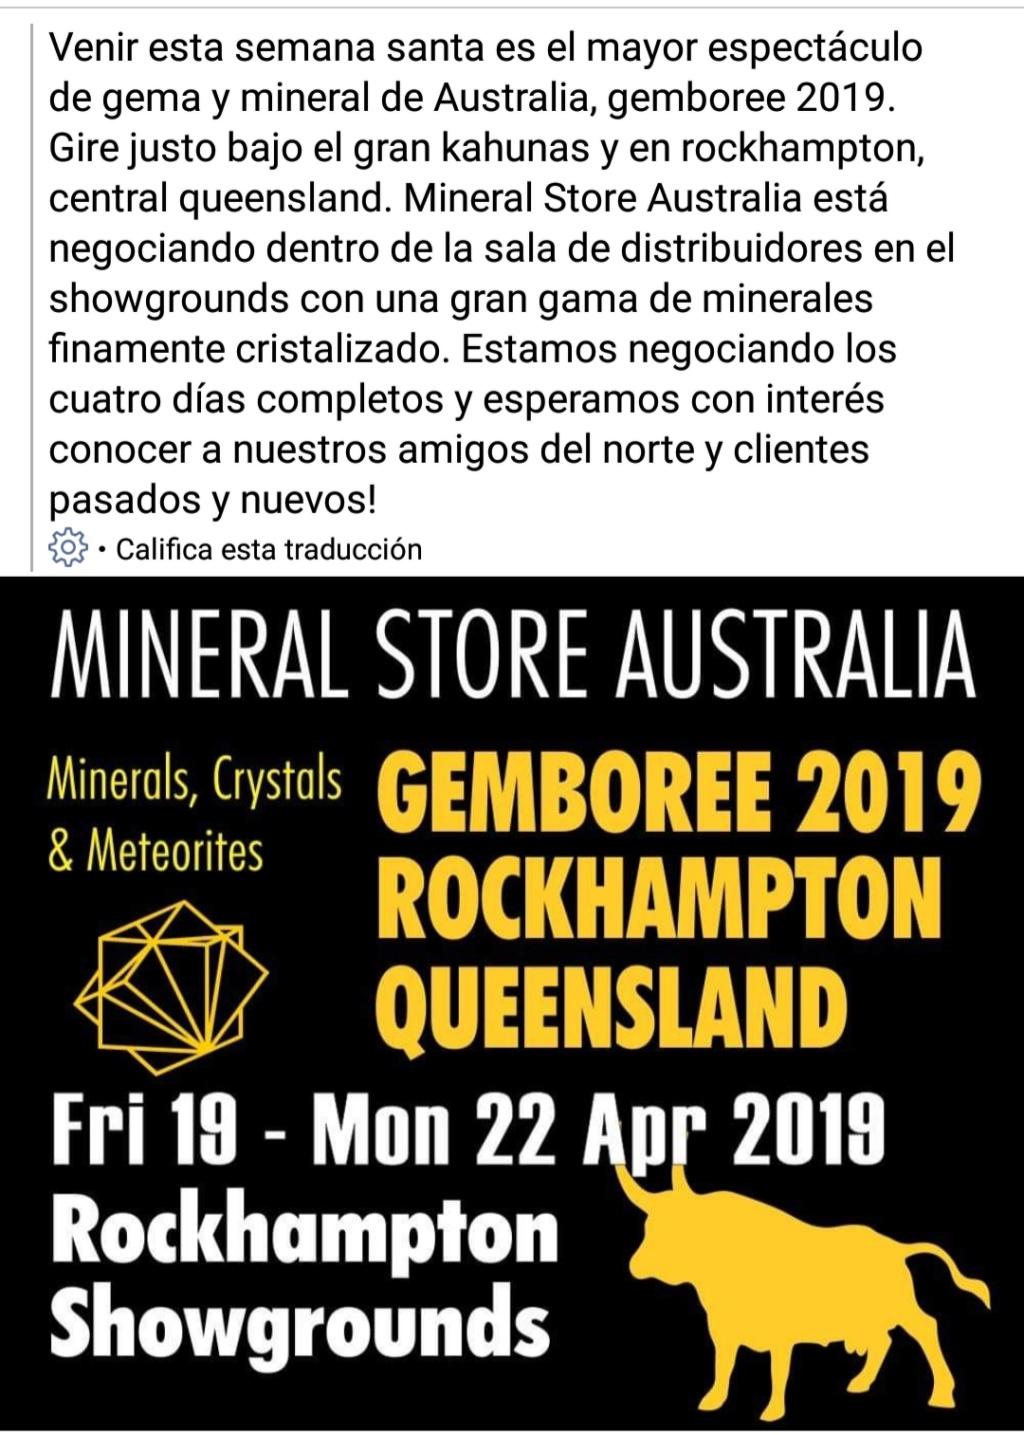 Ferias y eventos mes de Abril 2019. 20190410